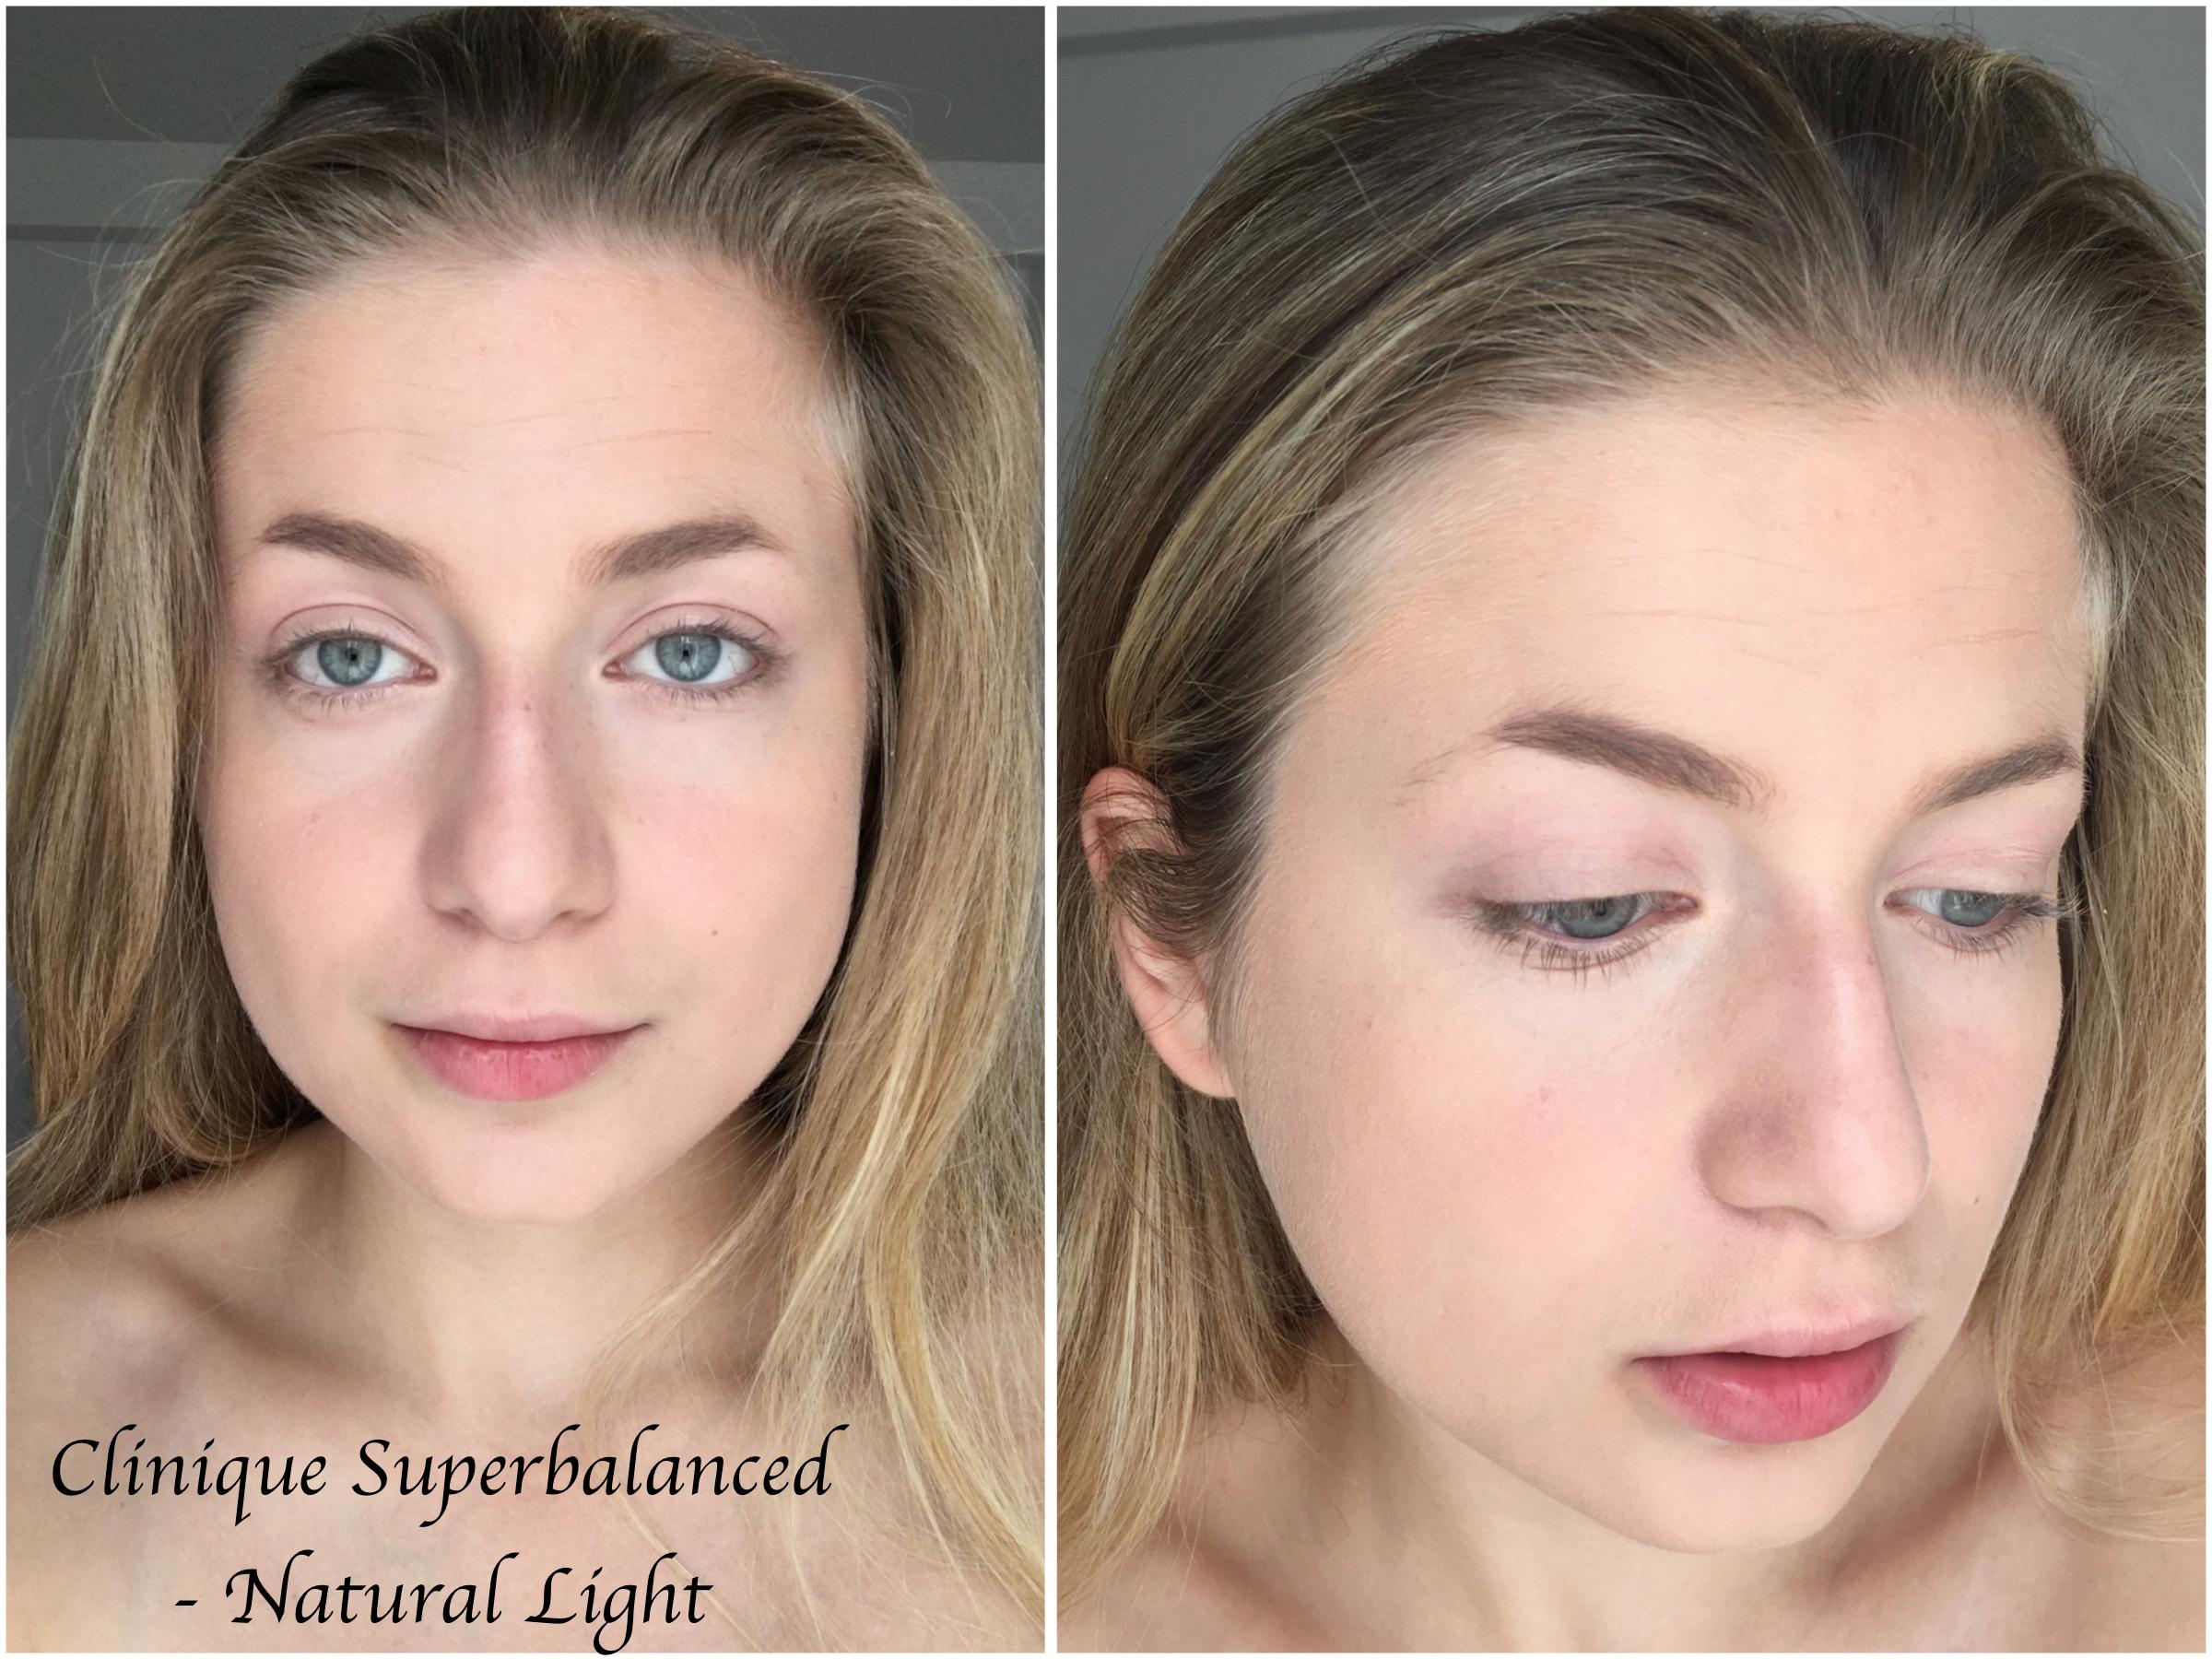 Clinique Superbalanced Makeup Foundation Review Swatches Demo